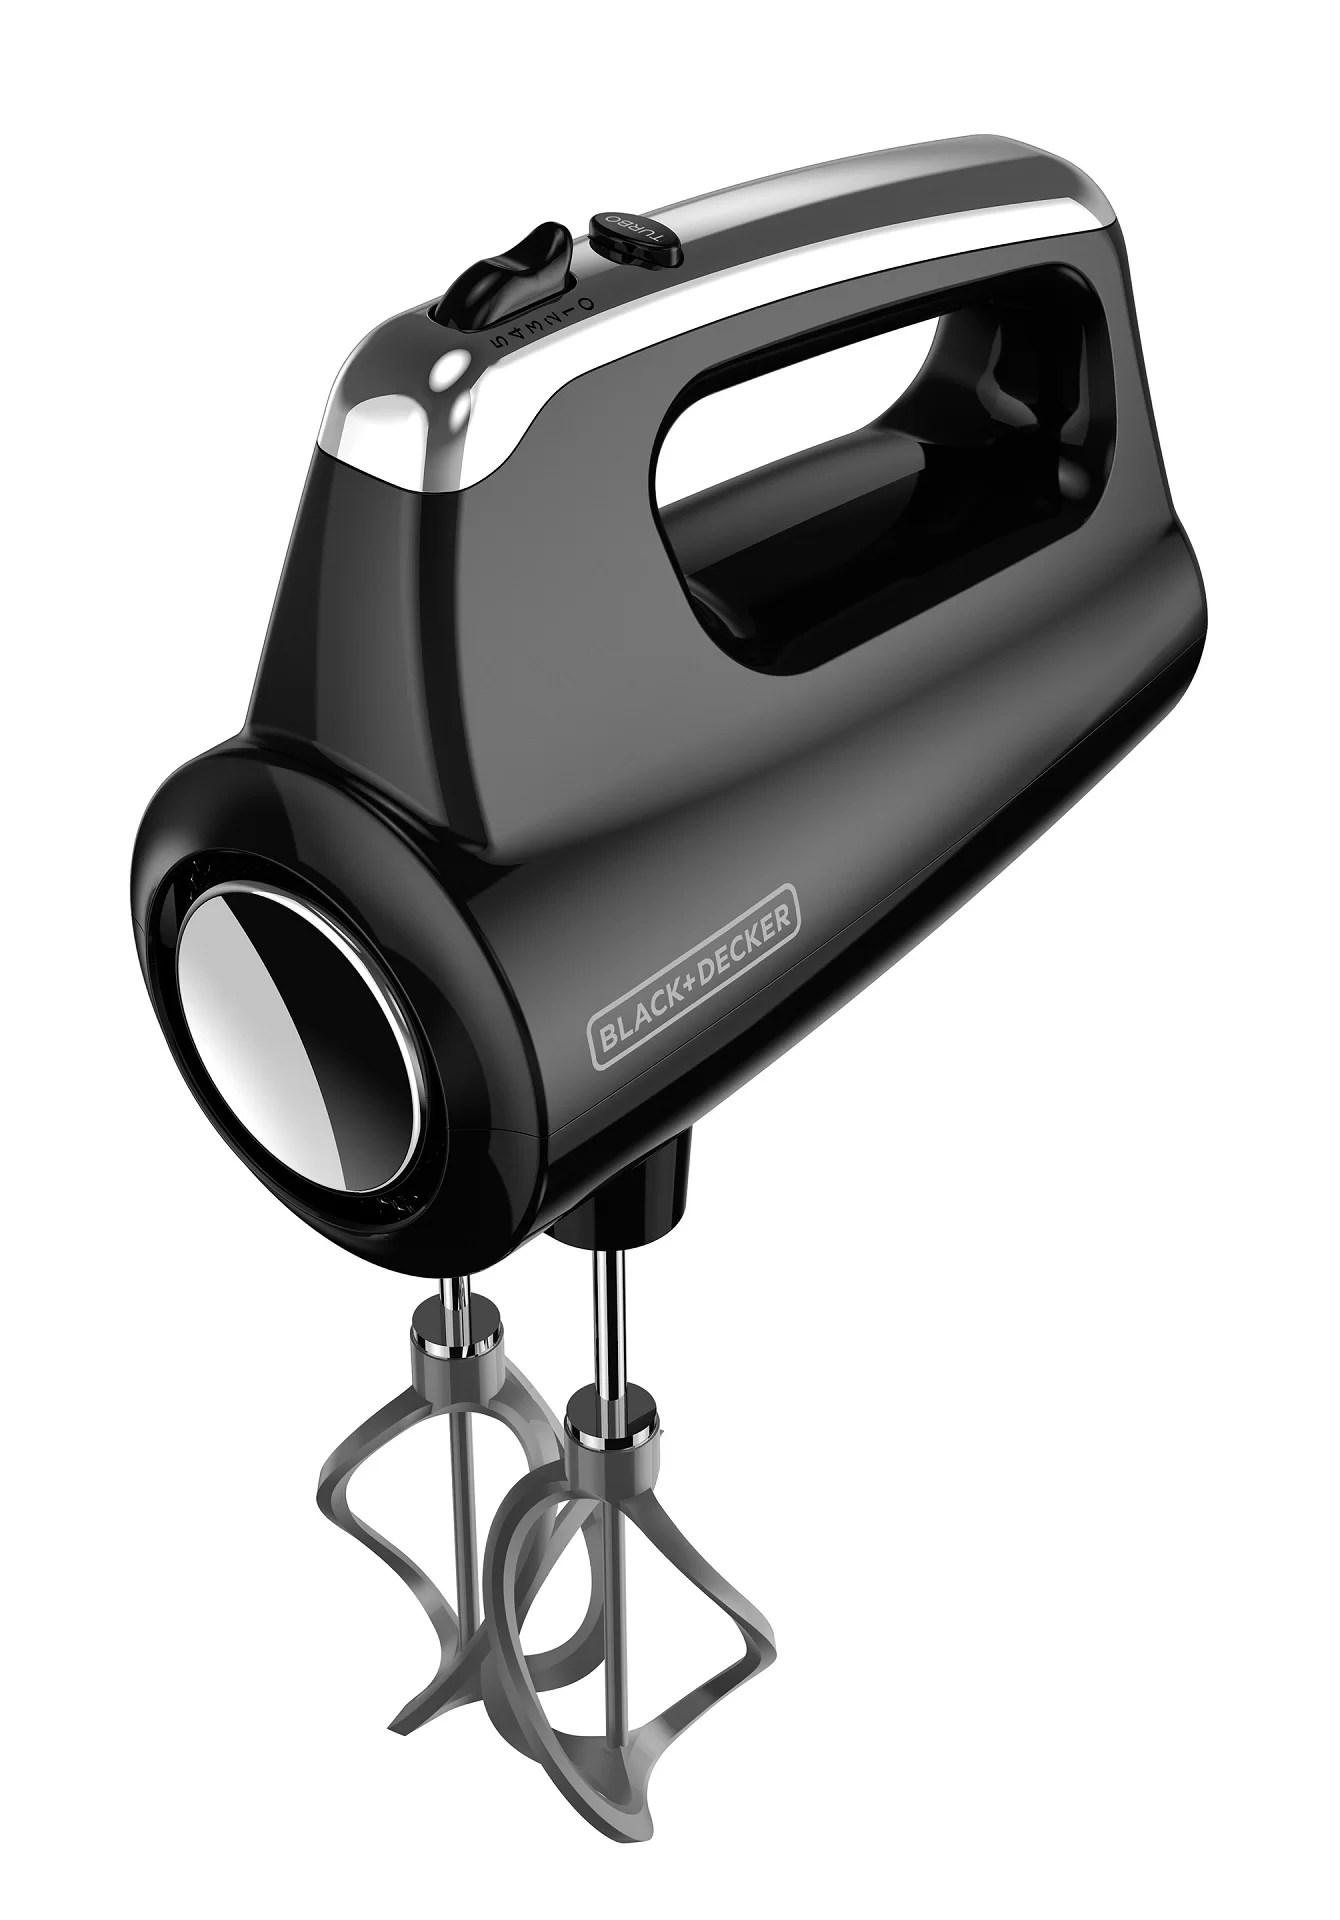 black decker helix performance premium 5 speed hand mixer